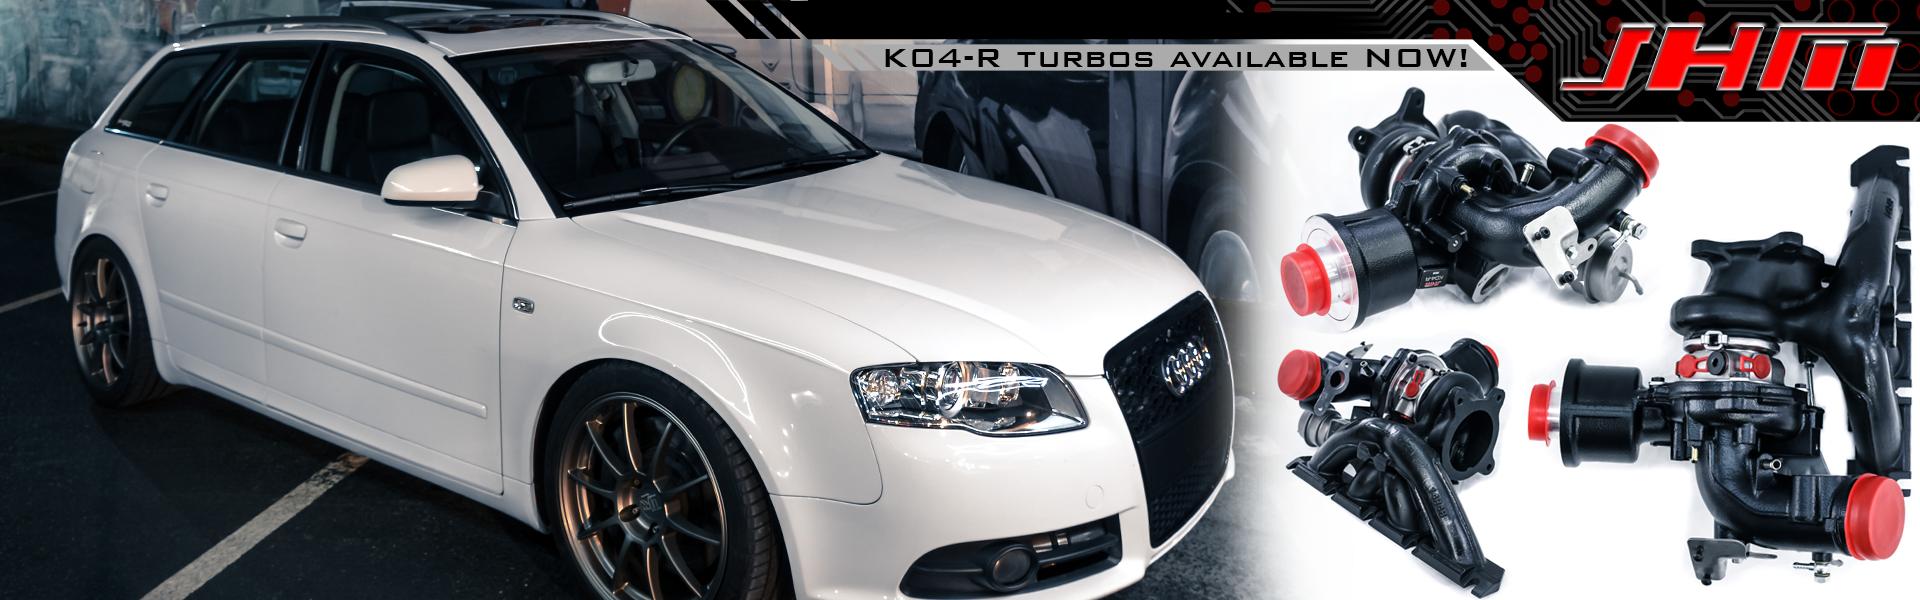 K04-R Turbos